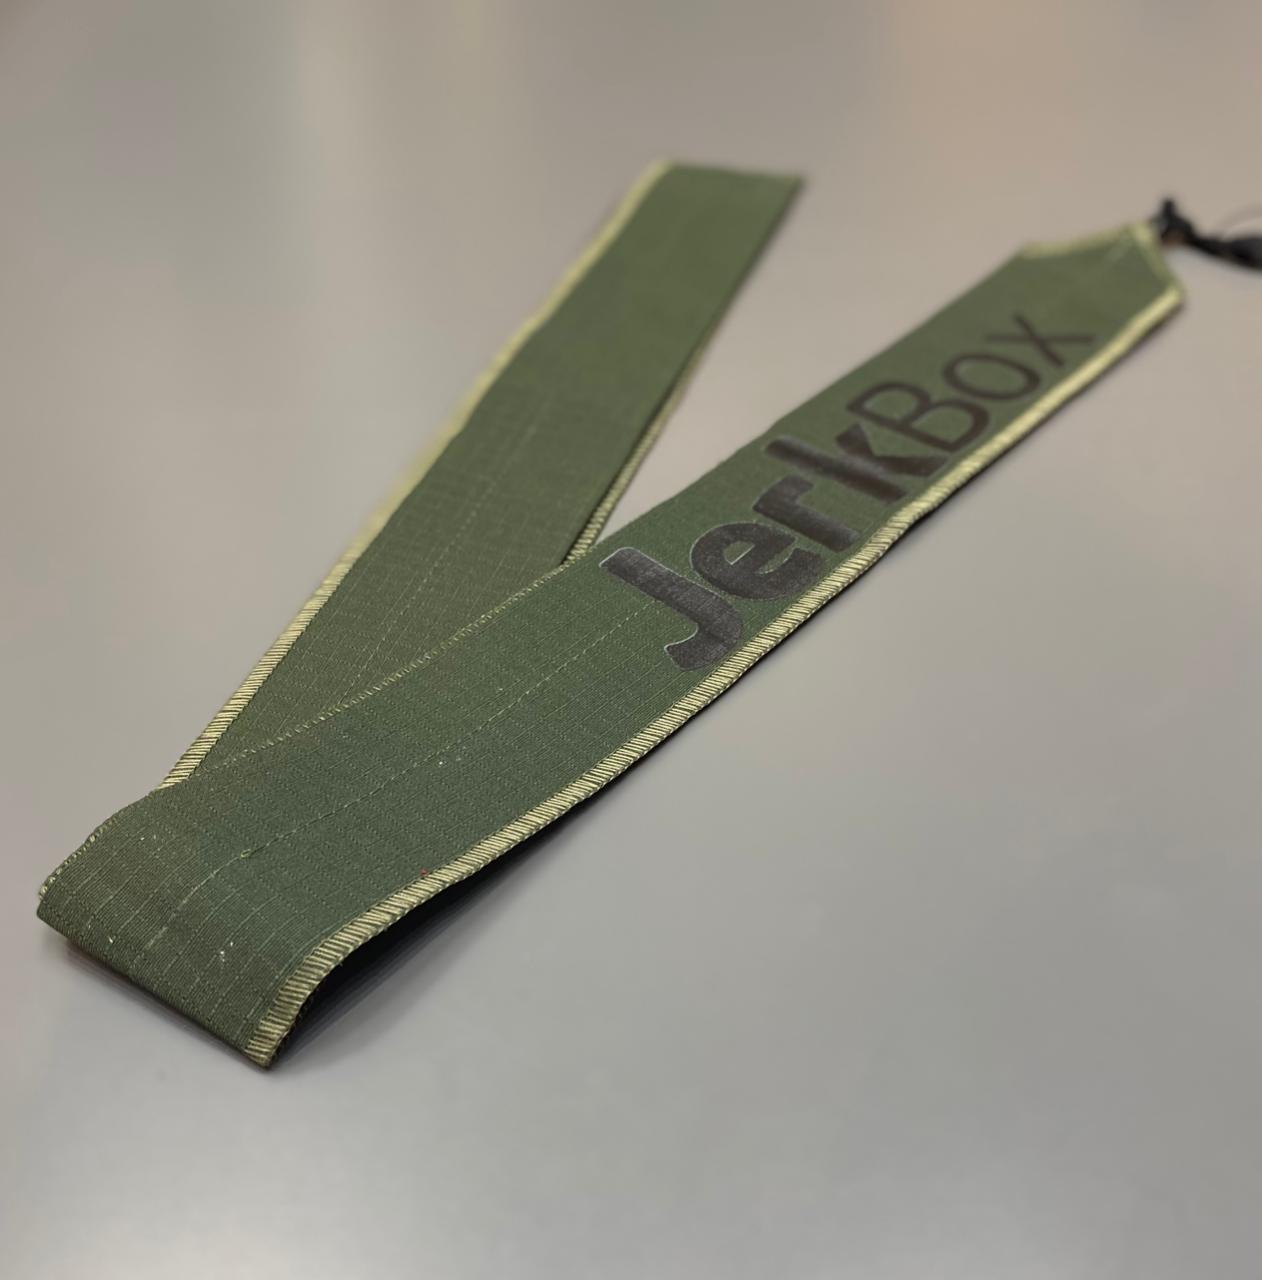 Munhequeira Wrist JerkBox Verde Militar